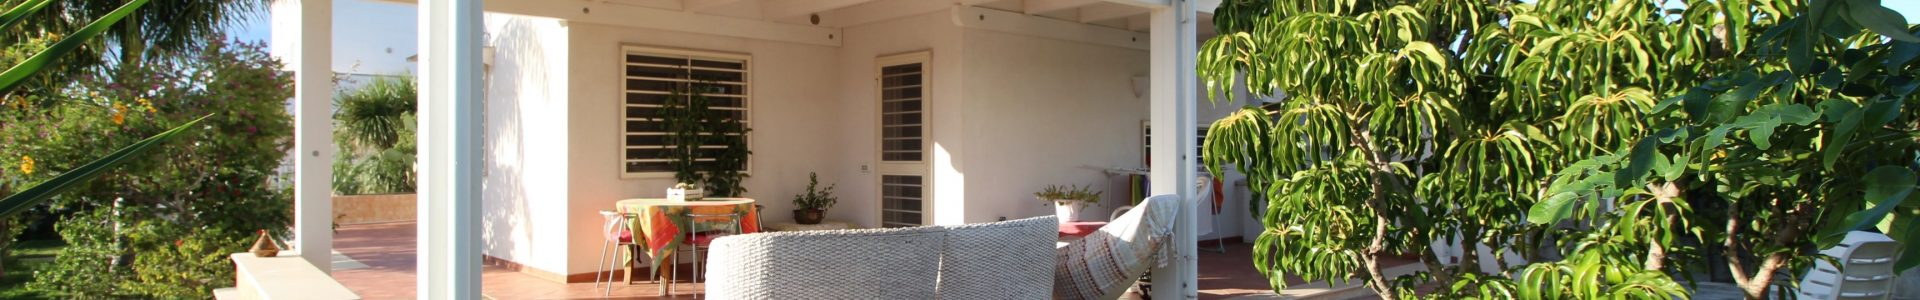 Bari – Santo Spirito , Rifinita villa con ampio giardino e box auto